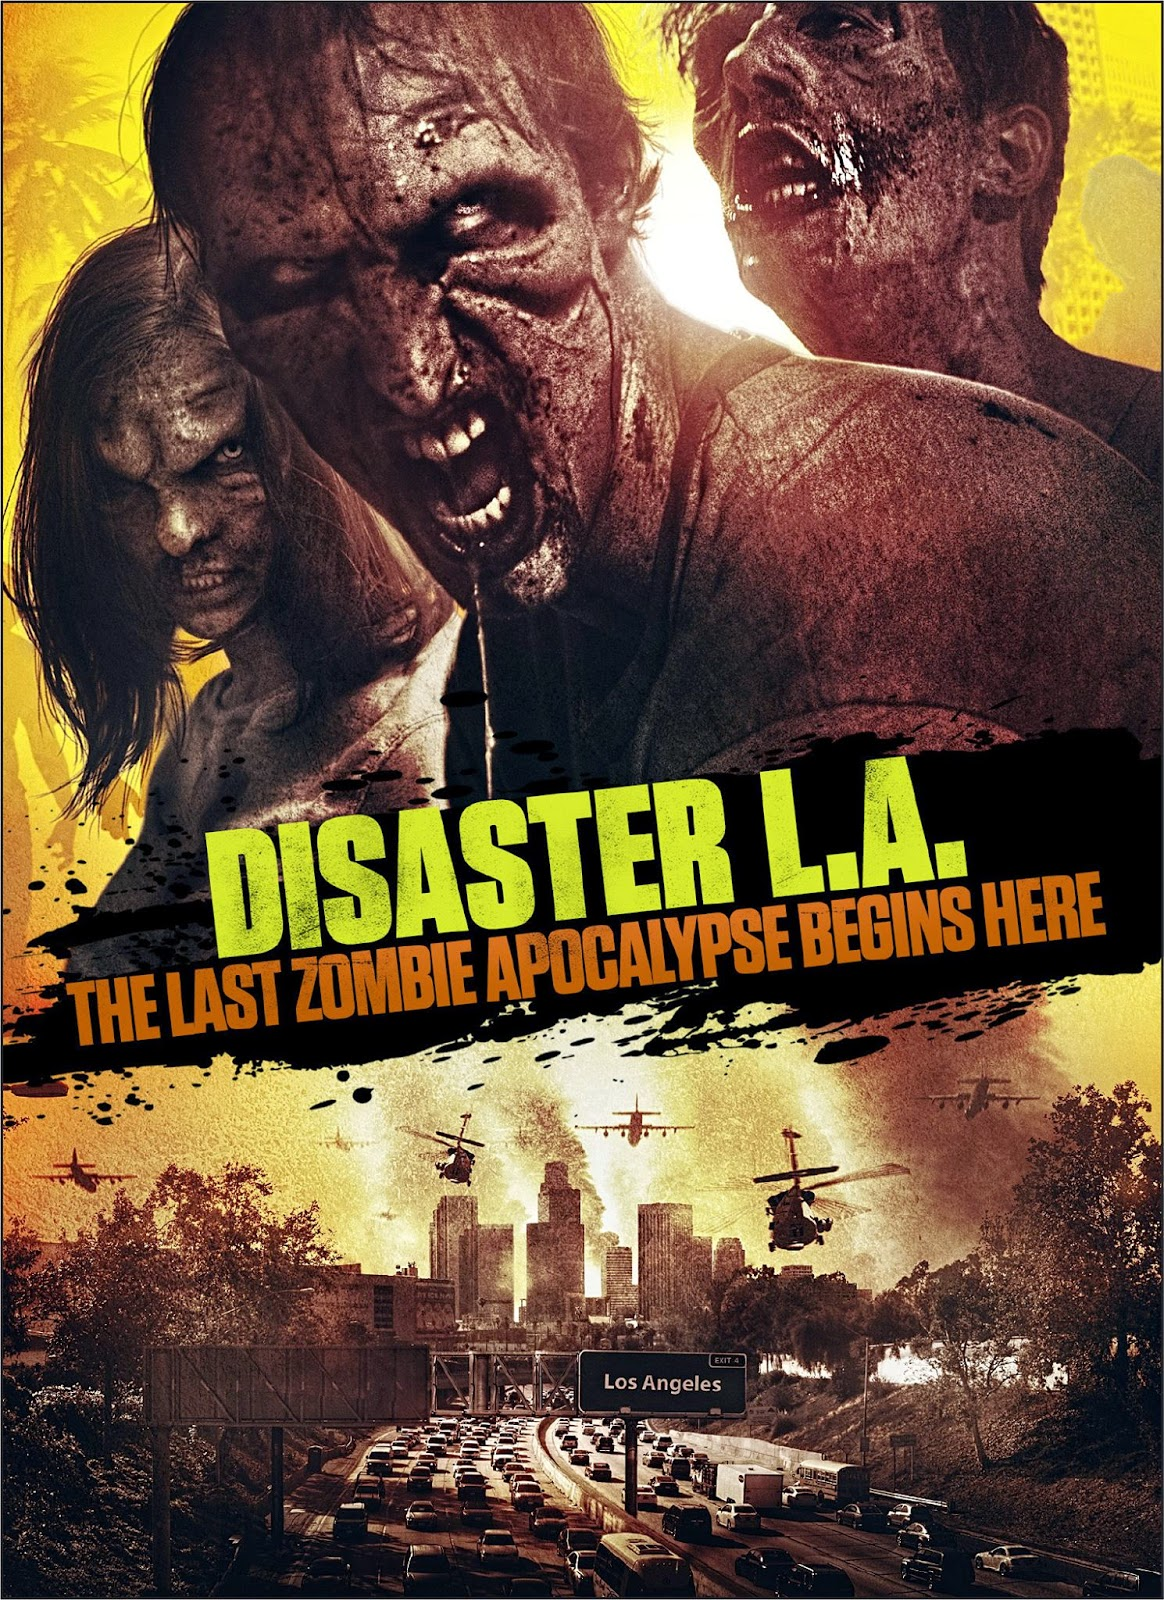 Disaster L.A. 2014, خلاصه فيلم Disaster L.A. 2014, دانلود تريلر فیلم Disaster L.A. 2014, دانلود رايگان فیلم Disaster L.A. 2014, دانلود زيرنويس Disaster L.A. 2014, دانلود فیلم Disaster L.A. 2014, دانلود فیلم Disaster L.A. 2014 با زيرنويس فارسي, دانلود فیلم Disaster L.A. 2014 با لينک مستقيم, زيرنويس فارسي فیلم Disaster L.A. 2014, نقد فیلم Disaster L.A. 2014, کاور فیلم Disaster L.A. 2014